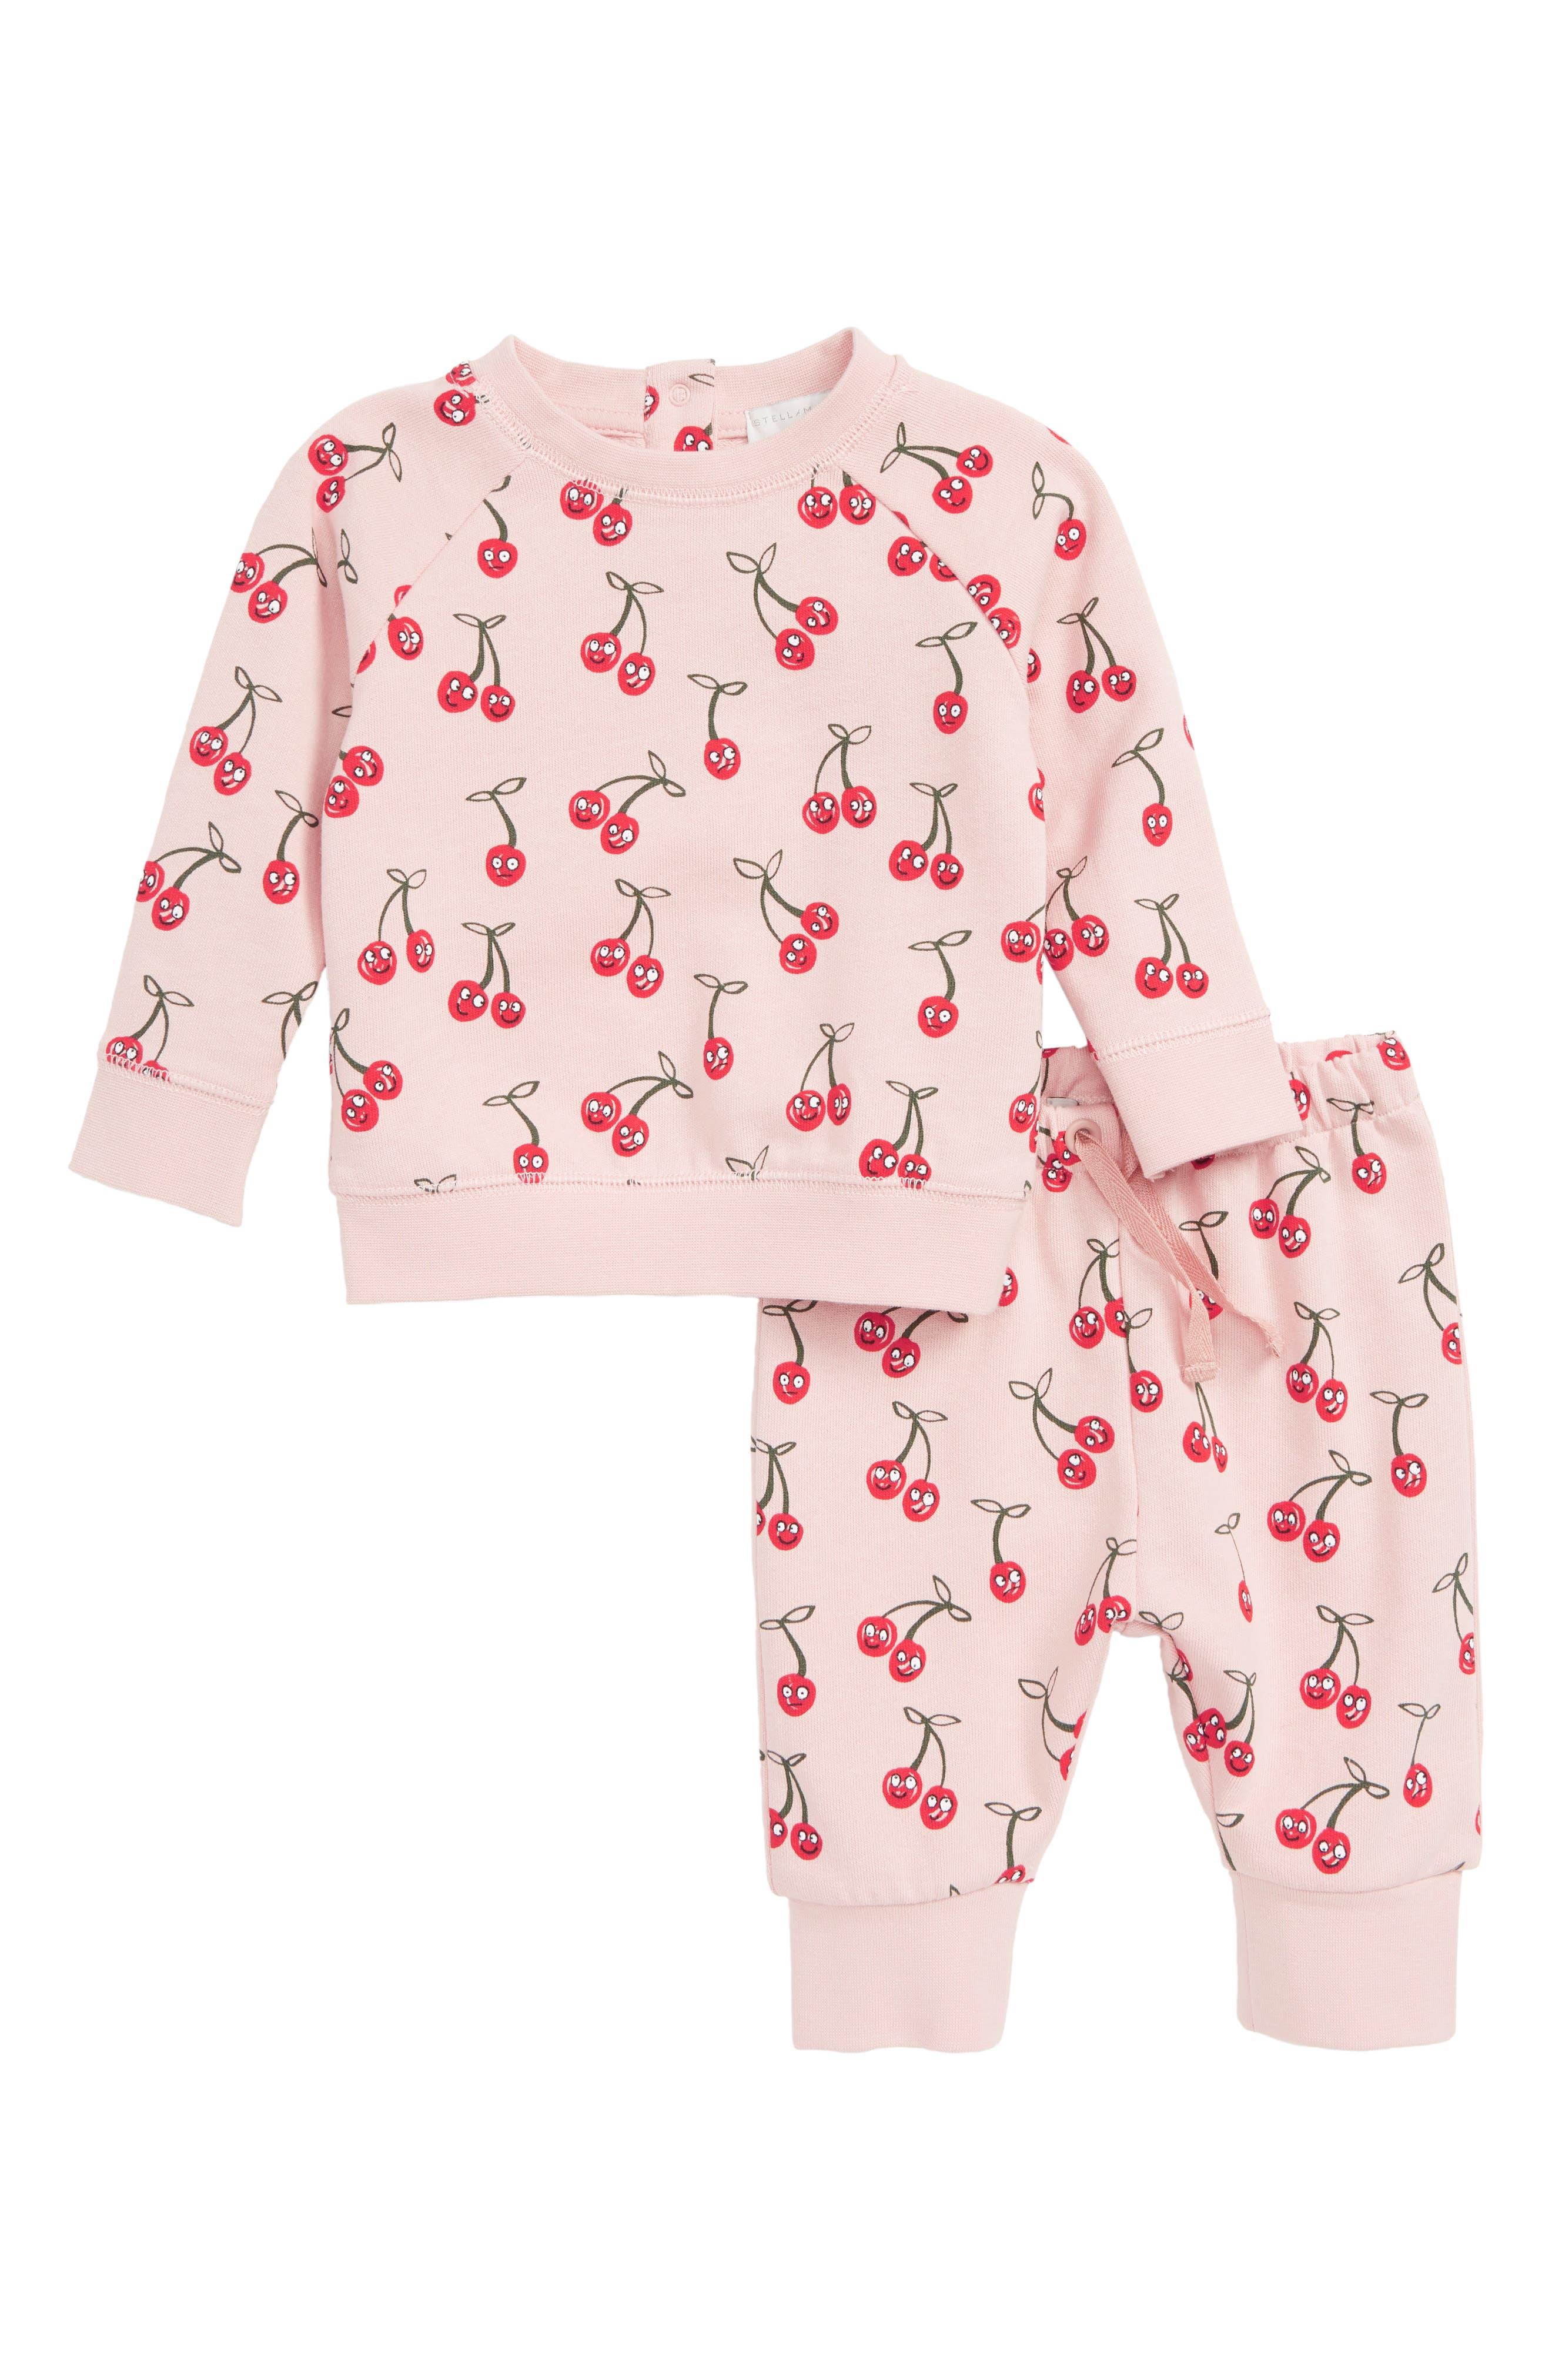 STELLA MCCARTNEY KIDS Cherries Sweatshirt & Sweatpants Set, Main, color, 5771 PINK